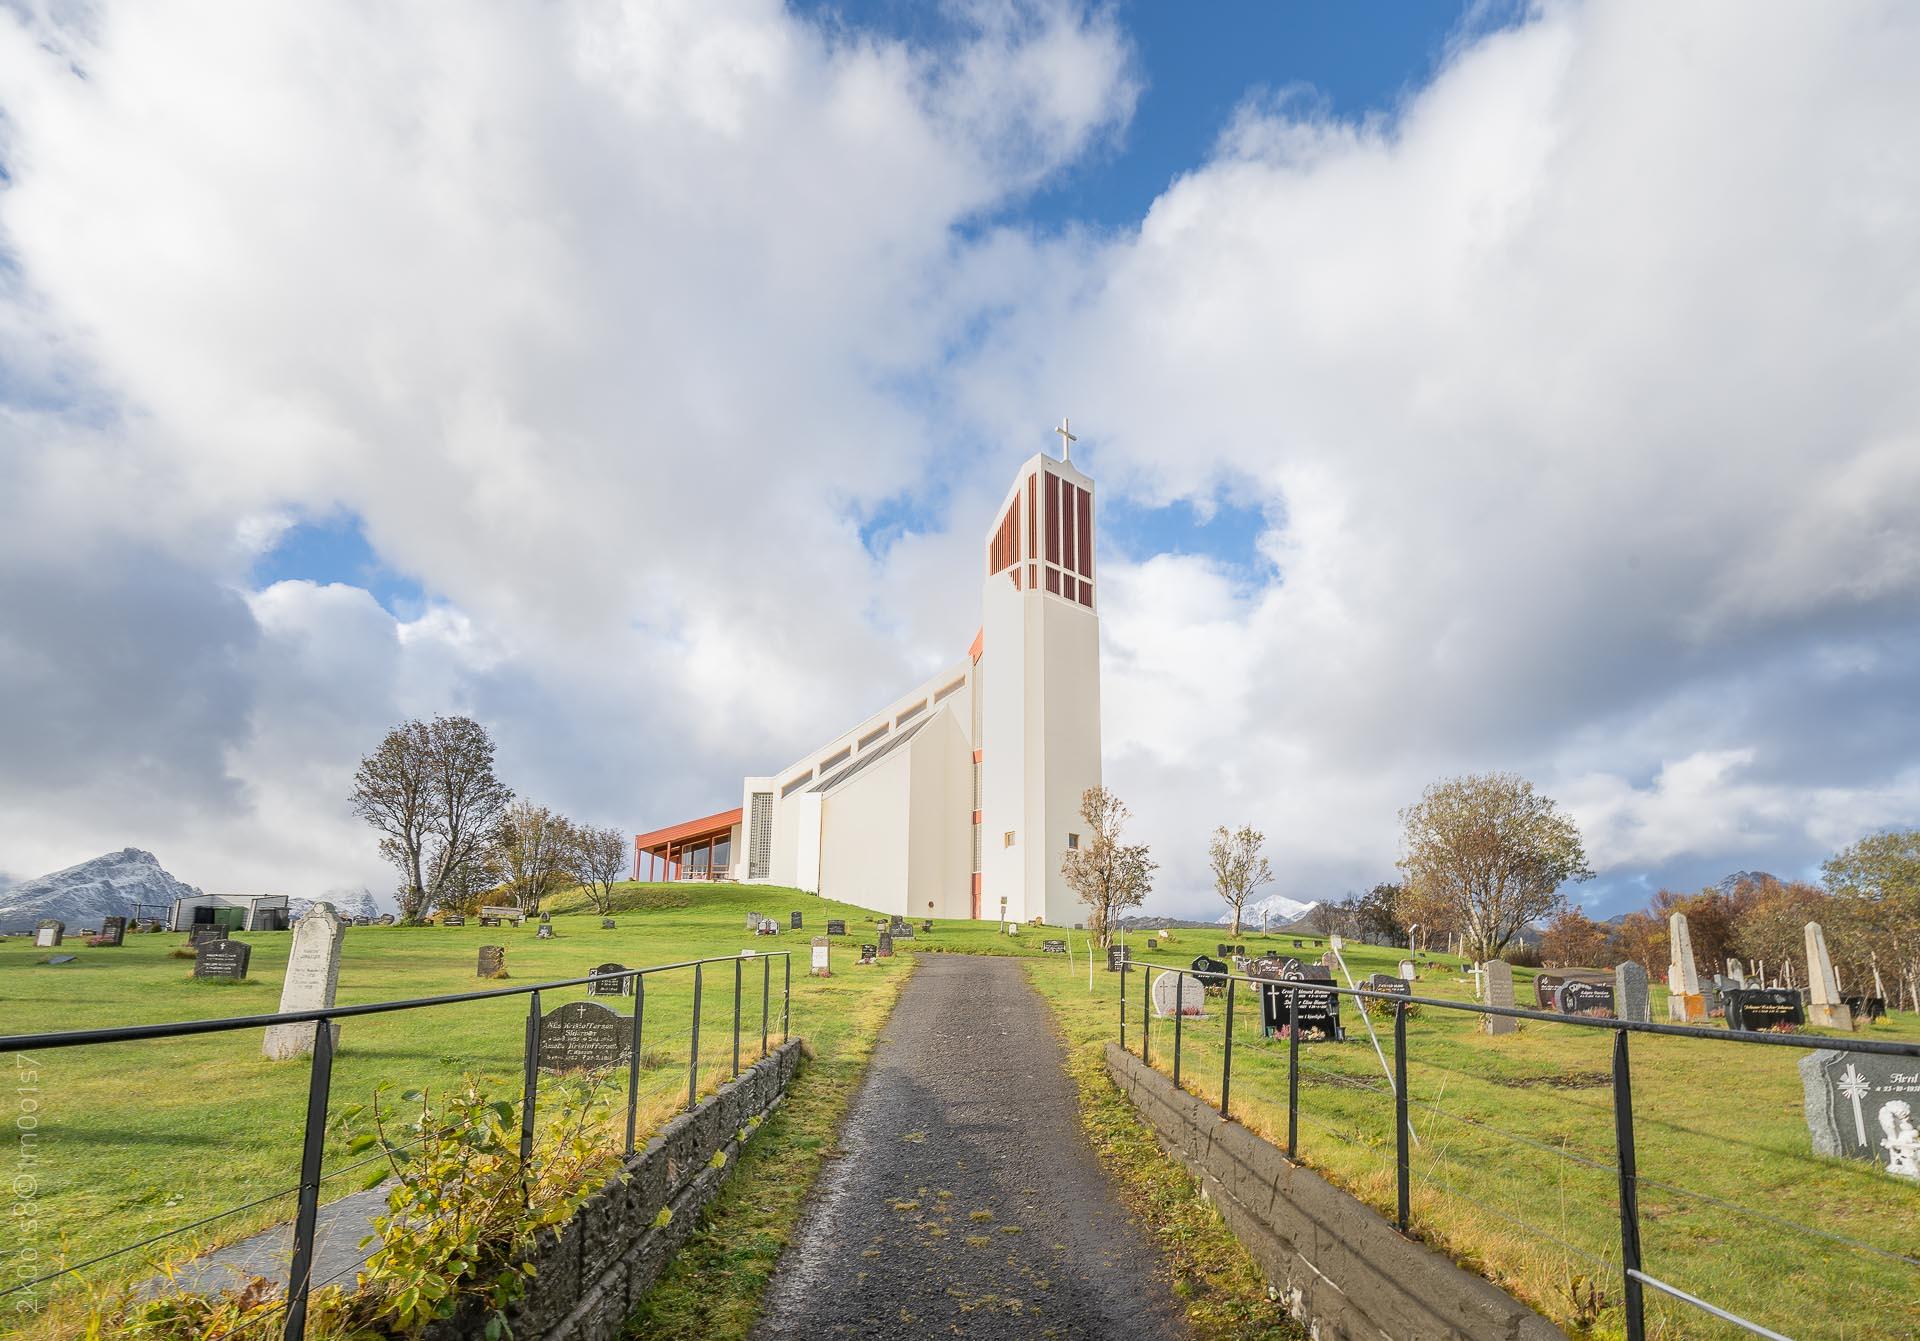 20181006-00518-CopyrightRobinLund-Borge-kirke-i-Lofoten